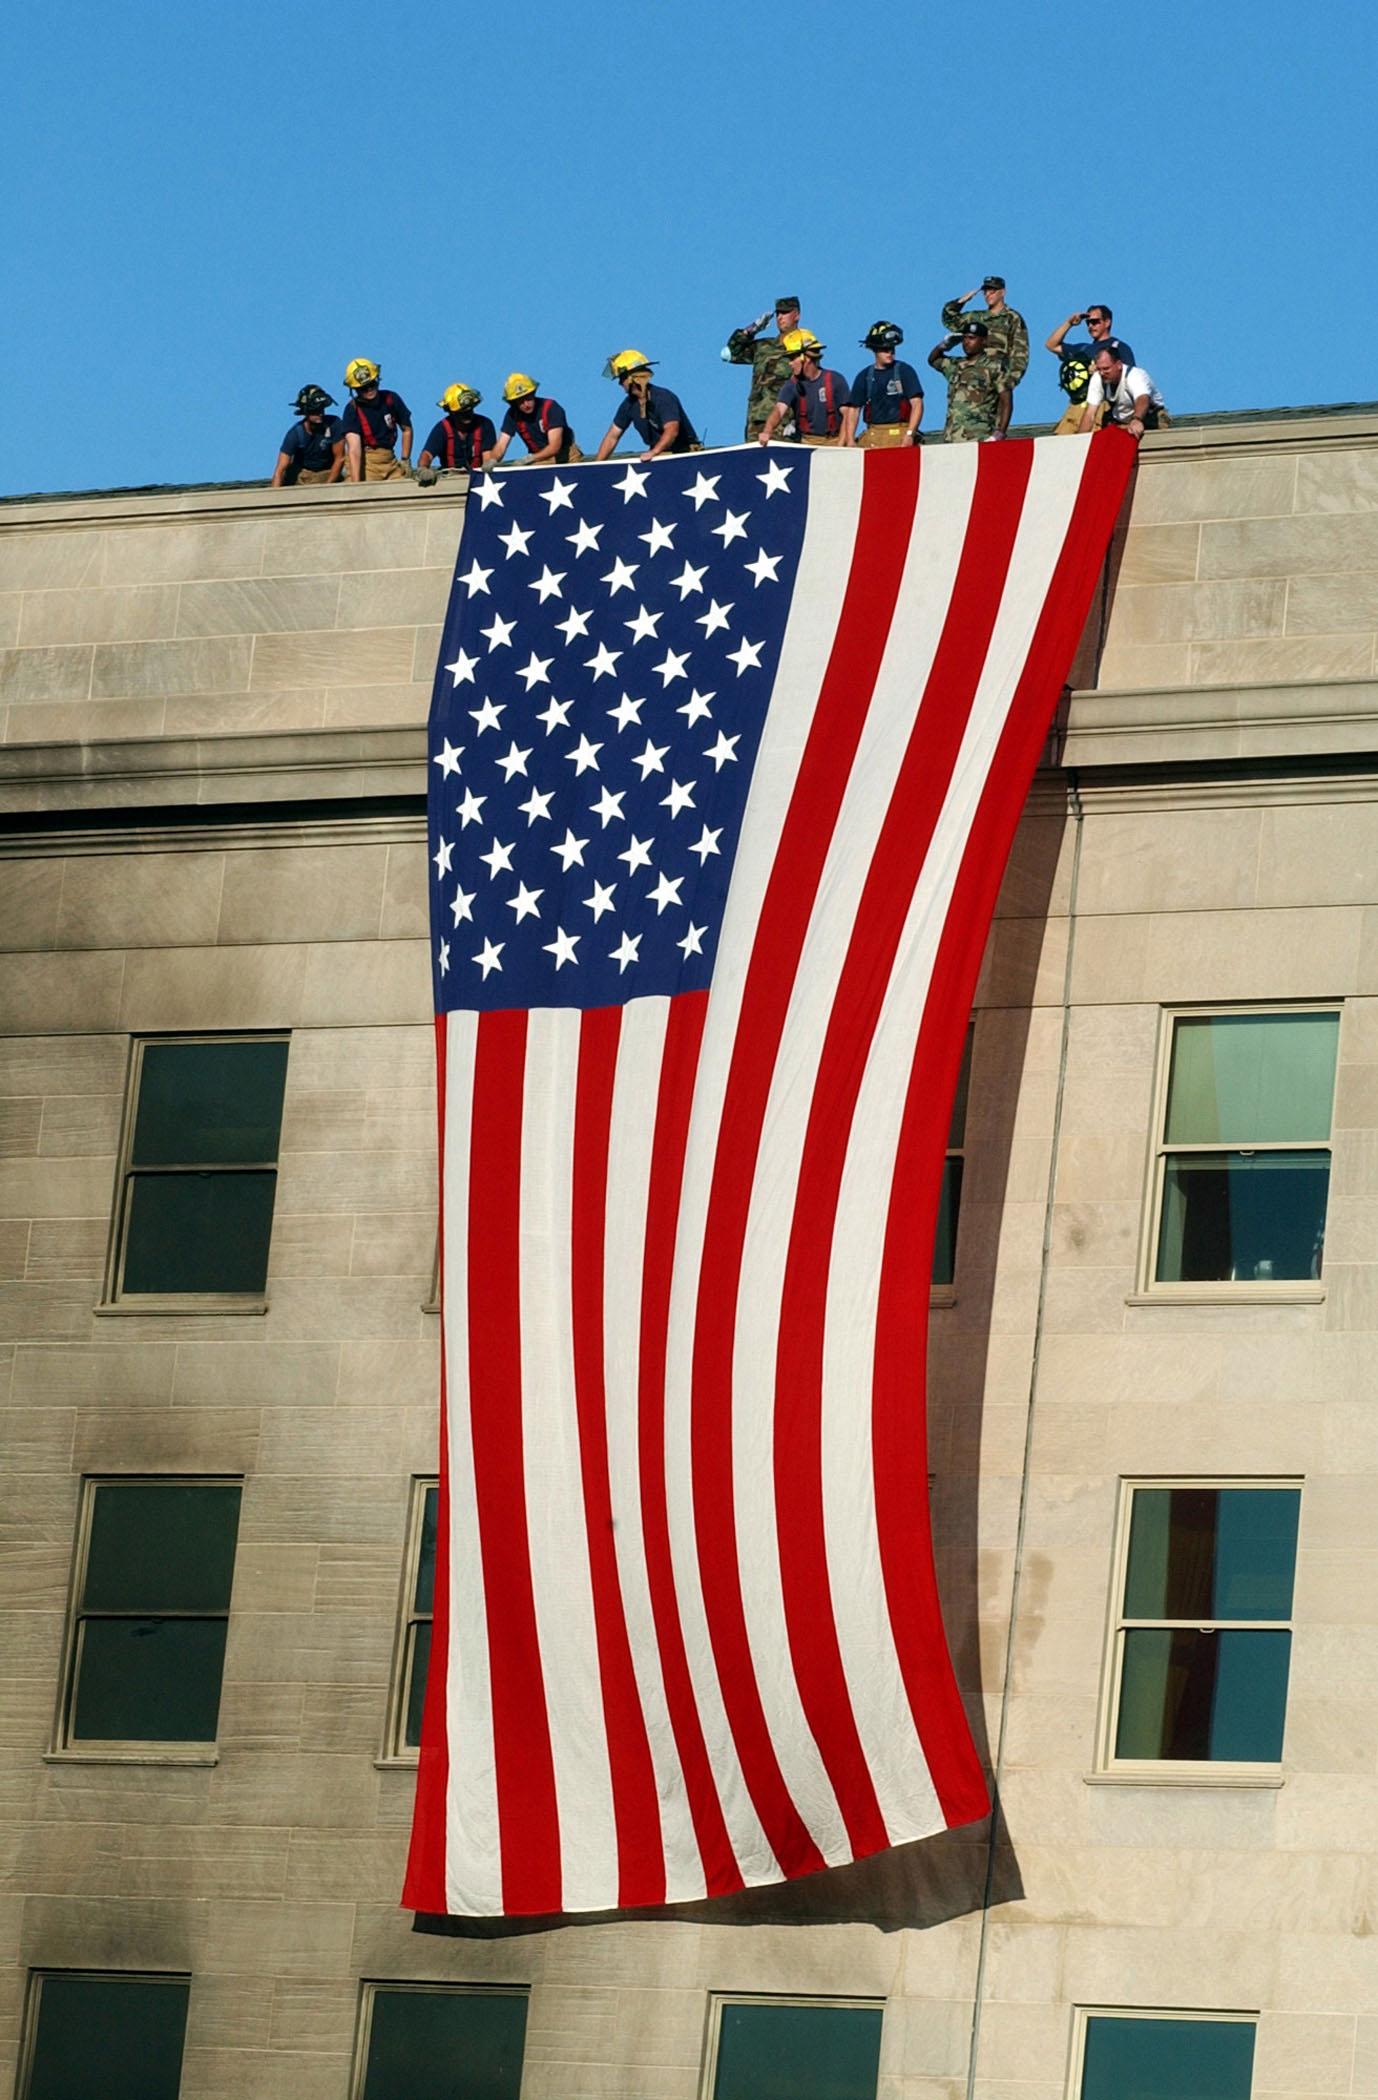 Us flag clipart 911 image free download Us flag clipart 911 - ClipartFest image free download